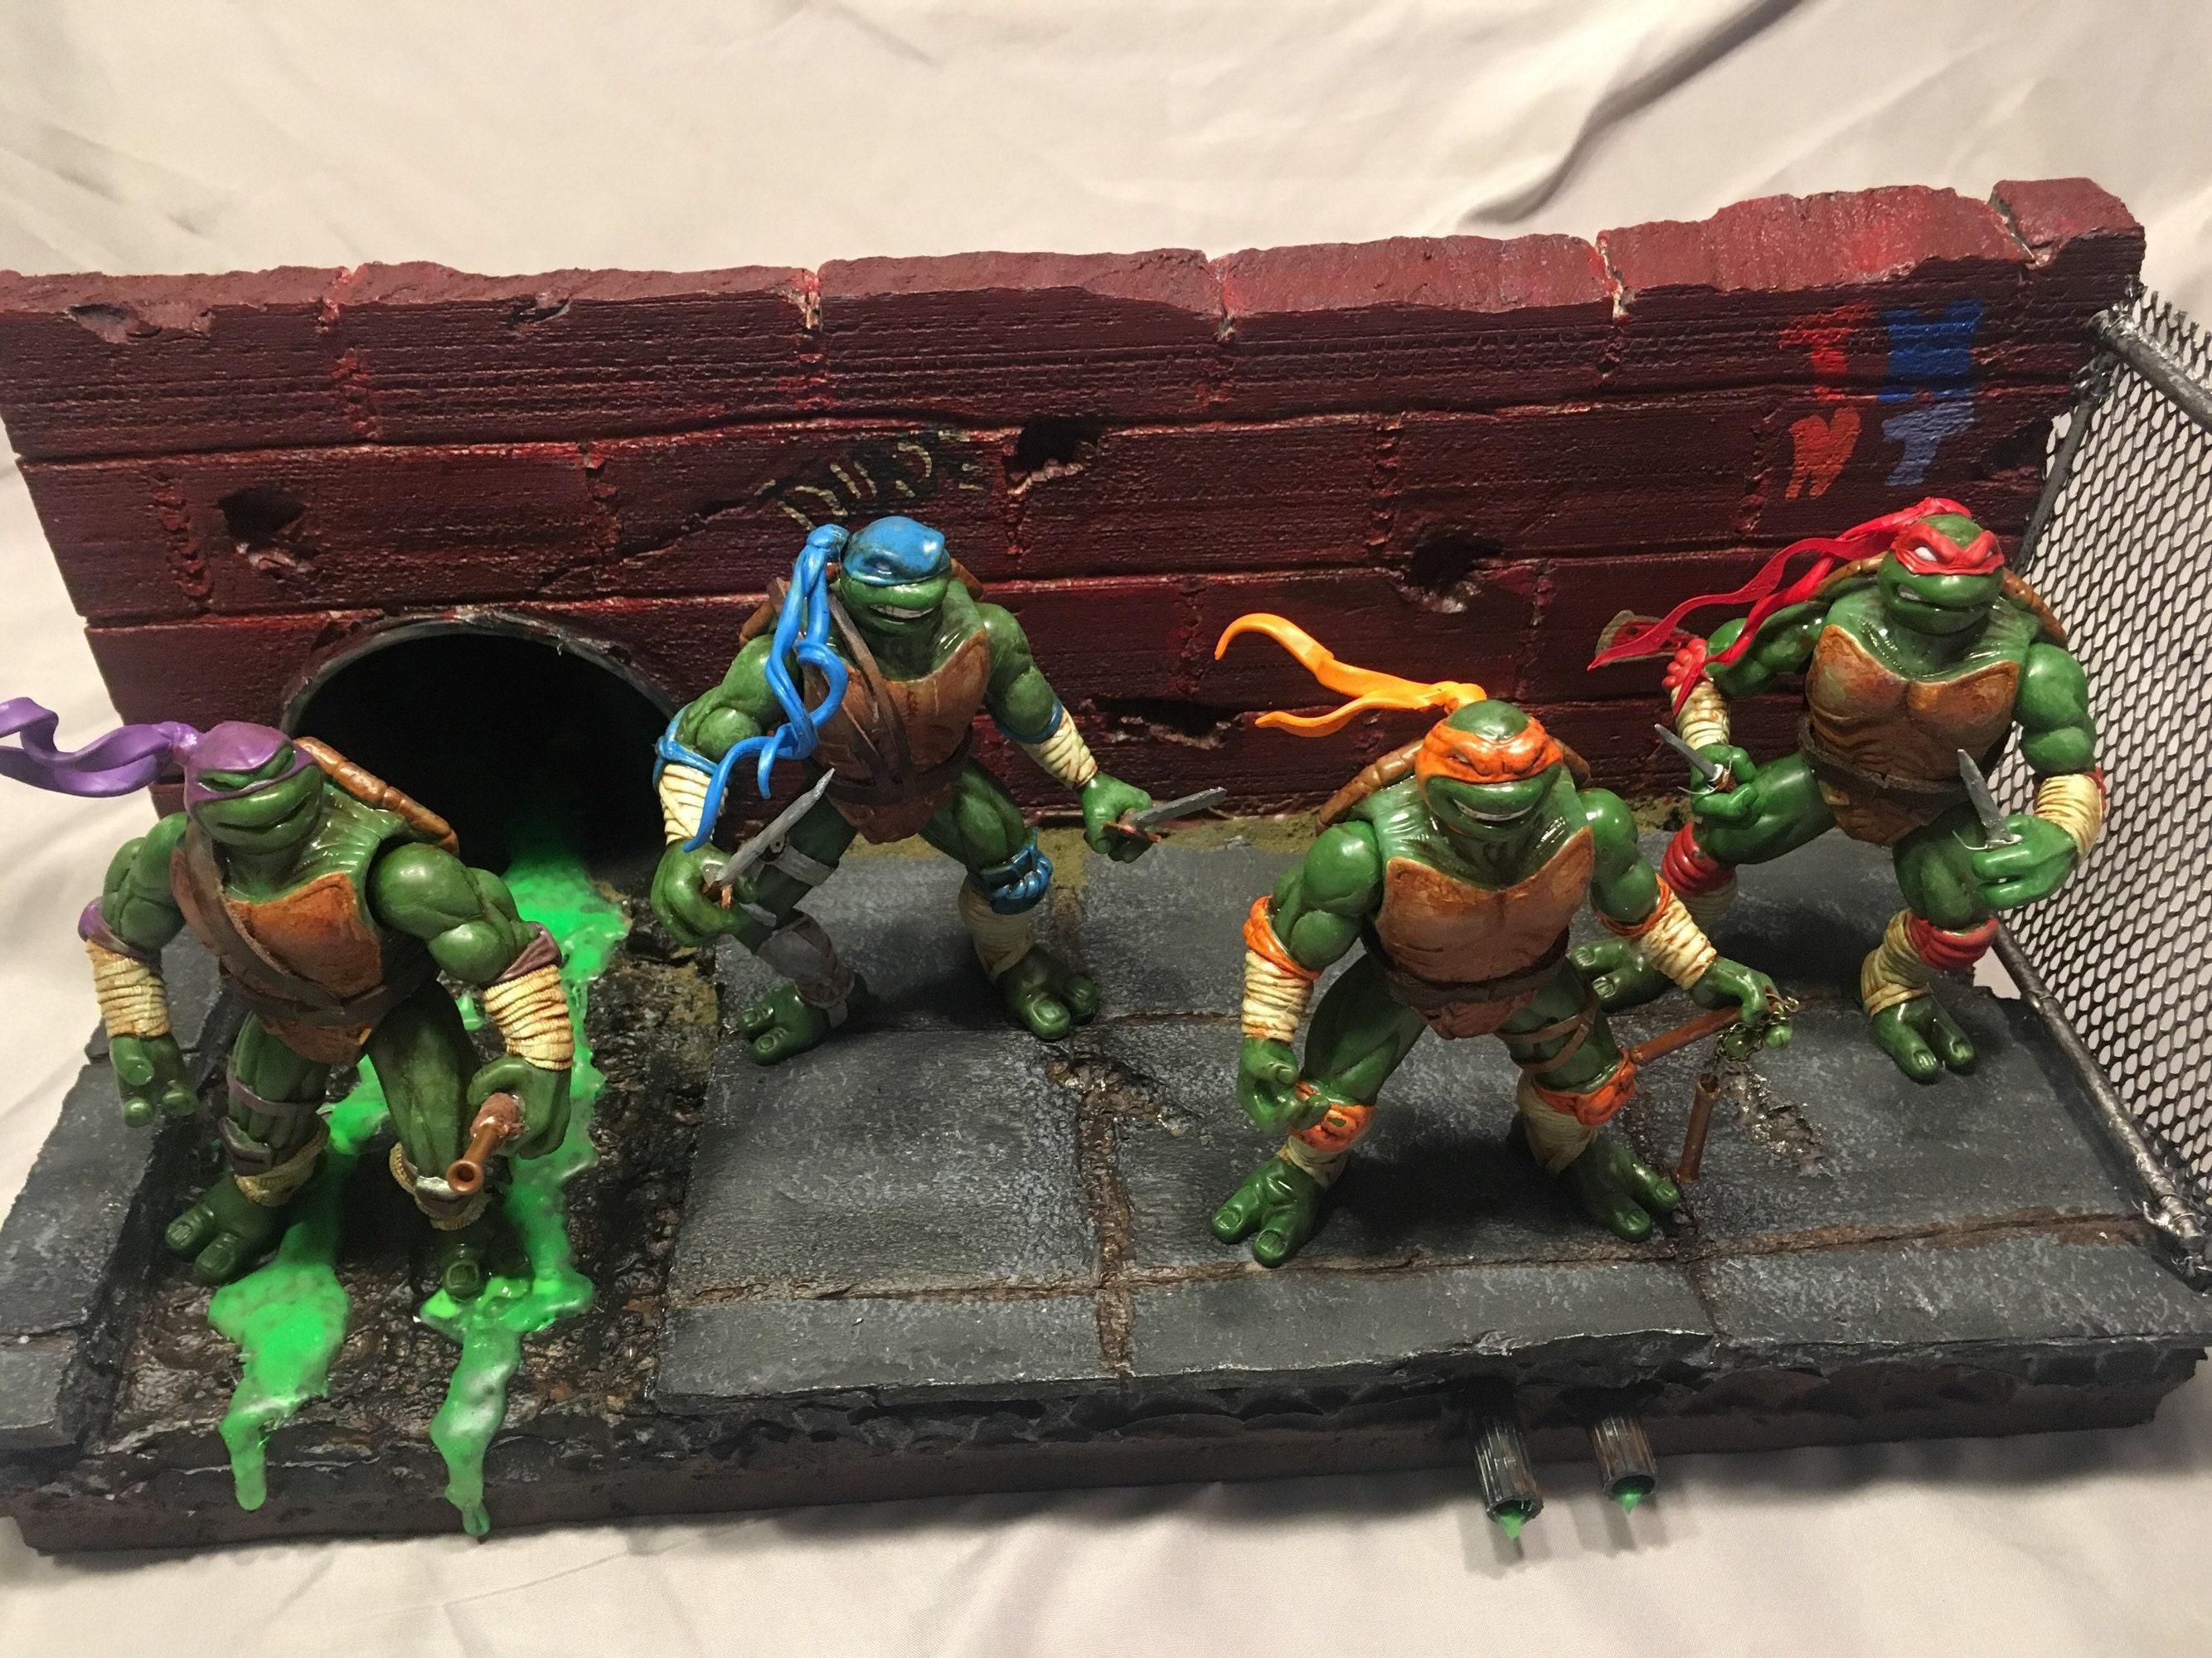 Custom TMNT Figures and Diorama